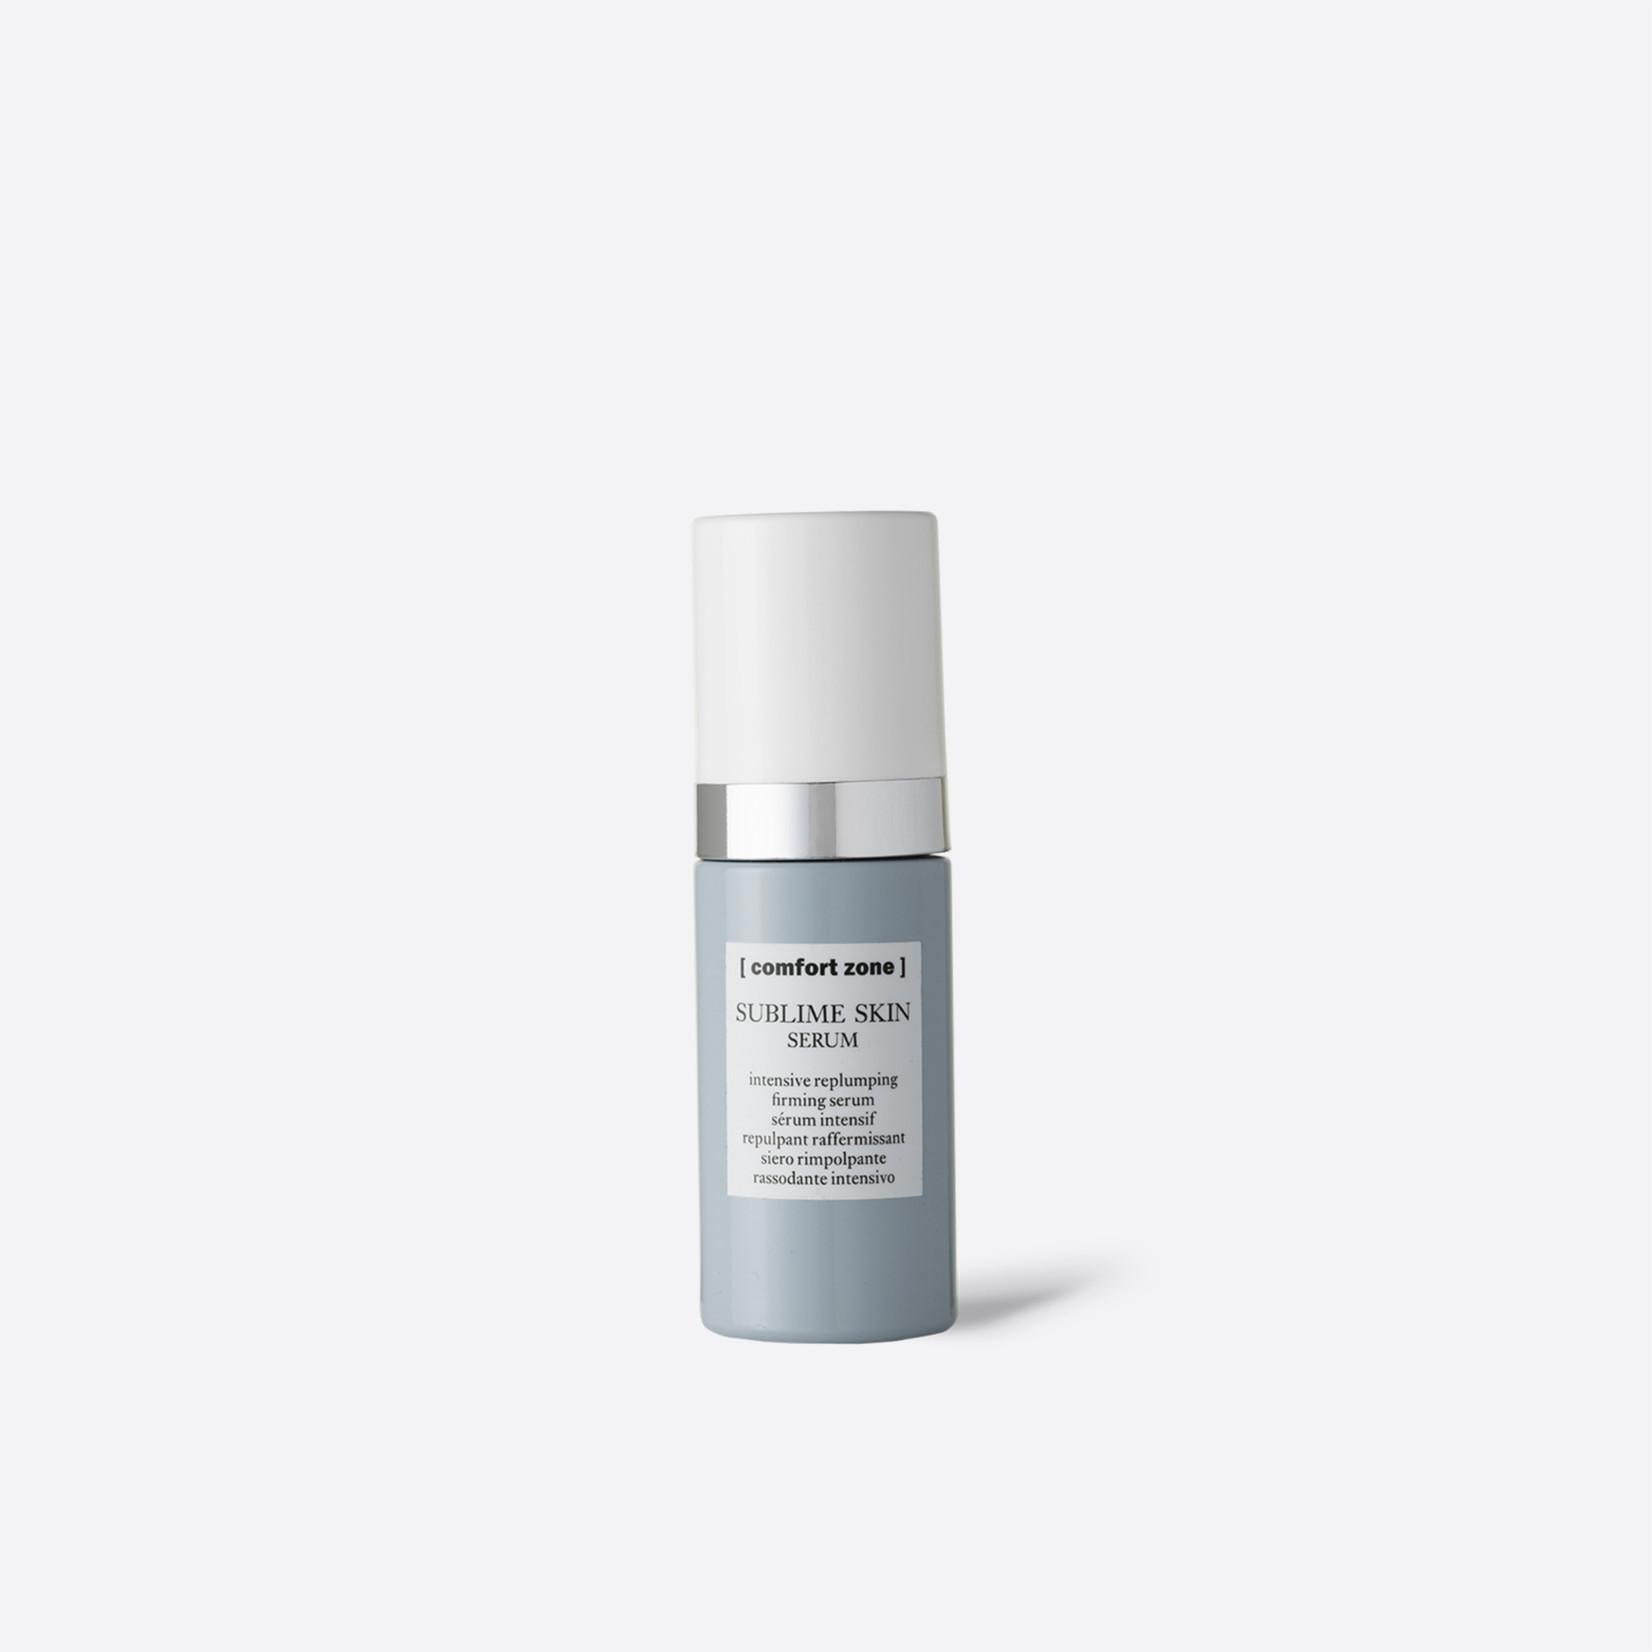 Comfort Zone Sublime Skin Serum